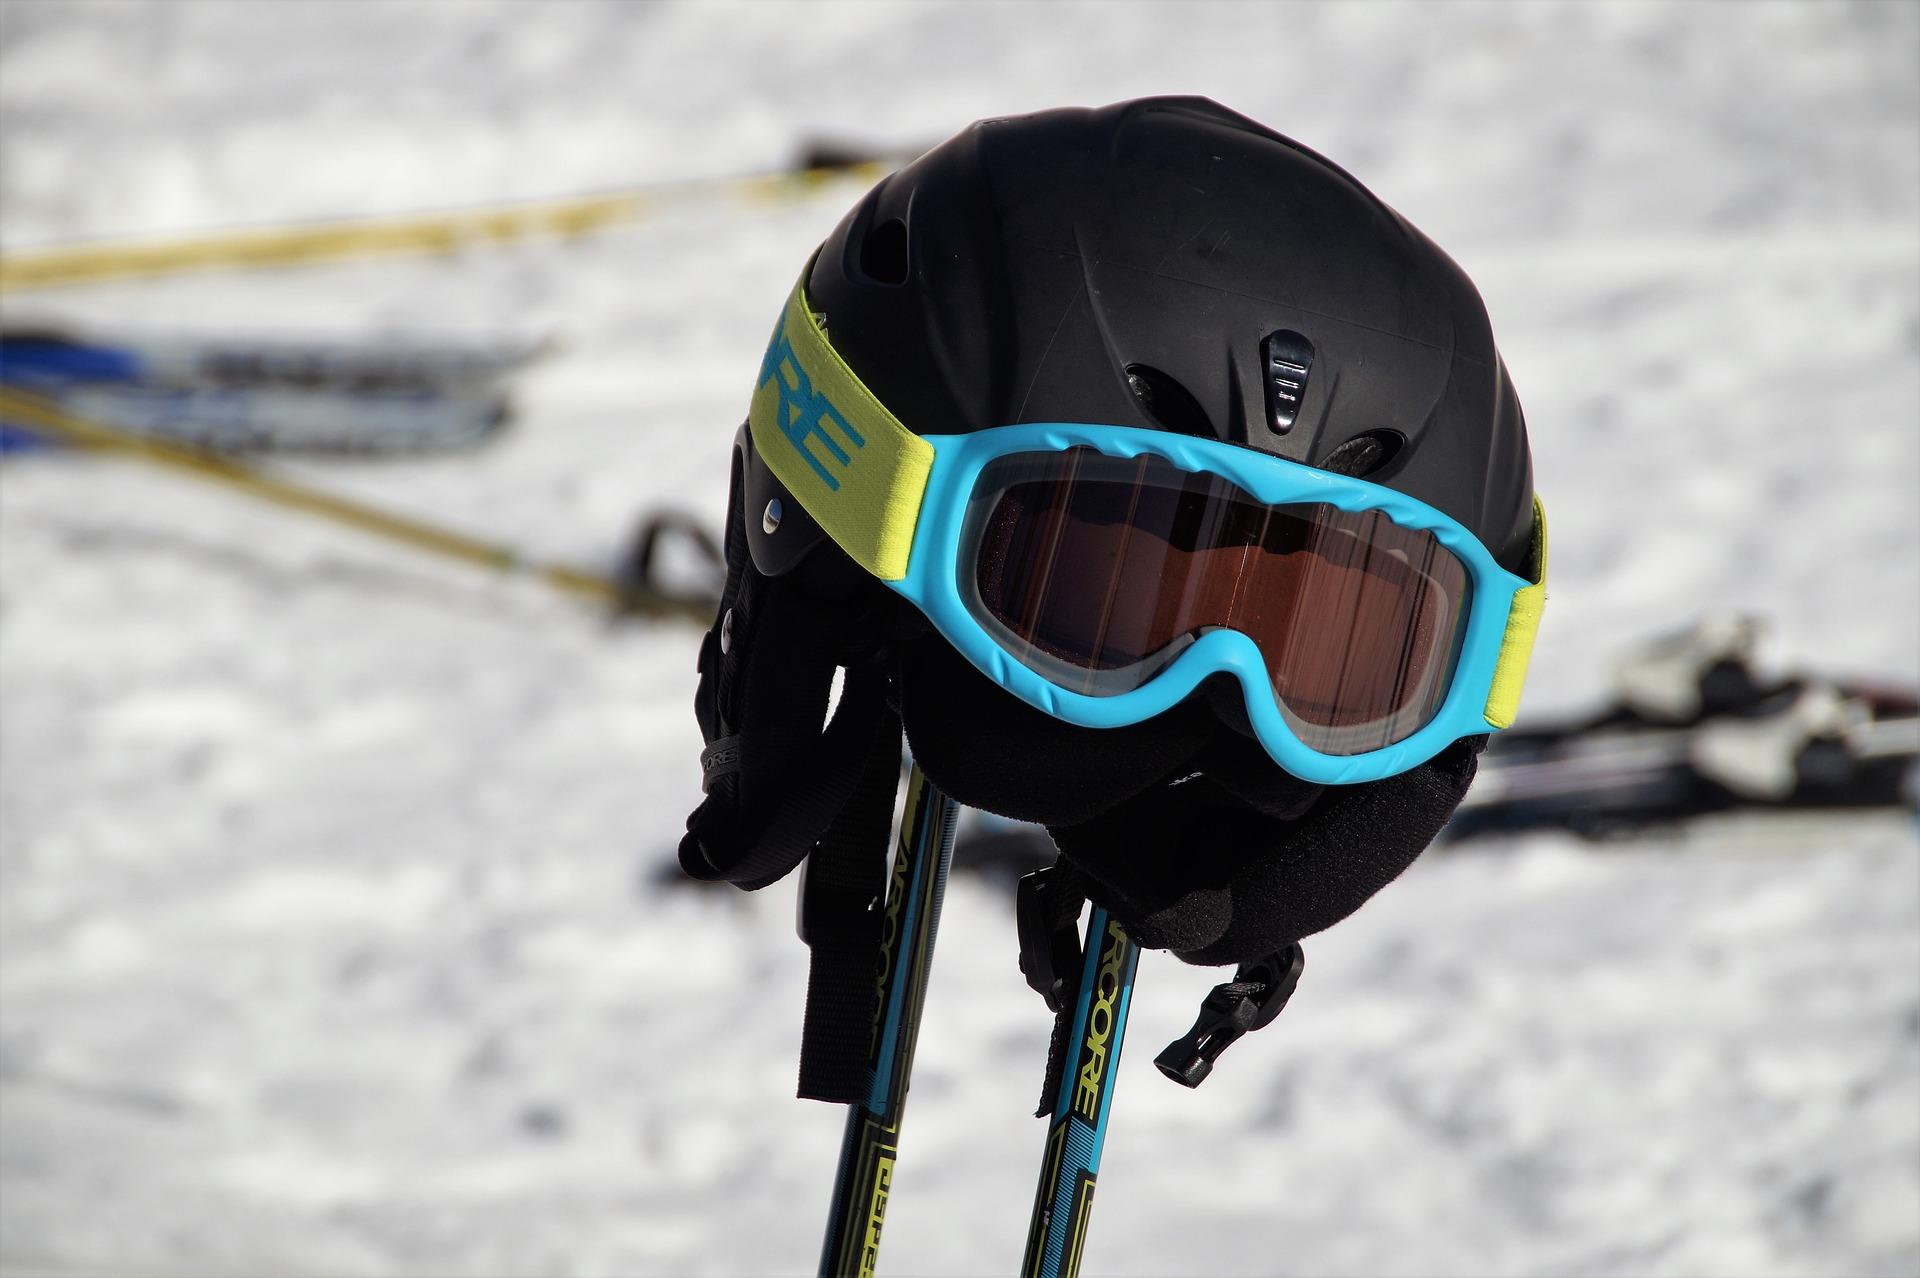 juiste skikleding 2